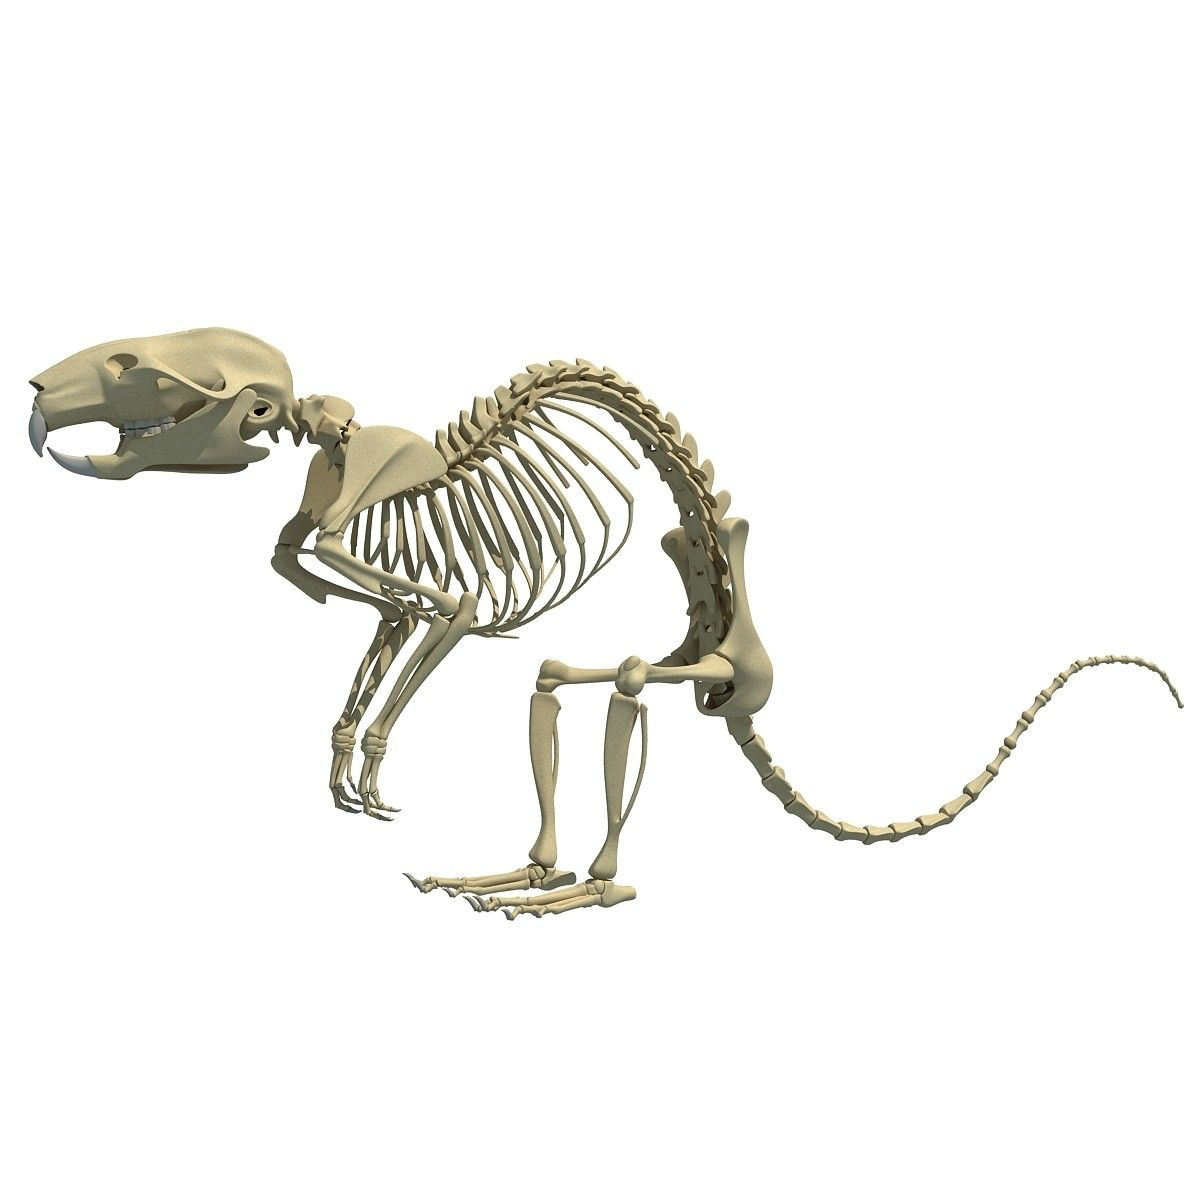 3d model rat skeleton | Животные | Pinterest | Rats, Skeletons and ...